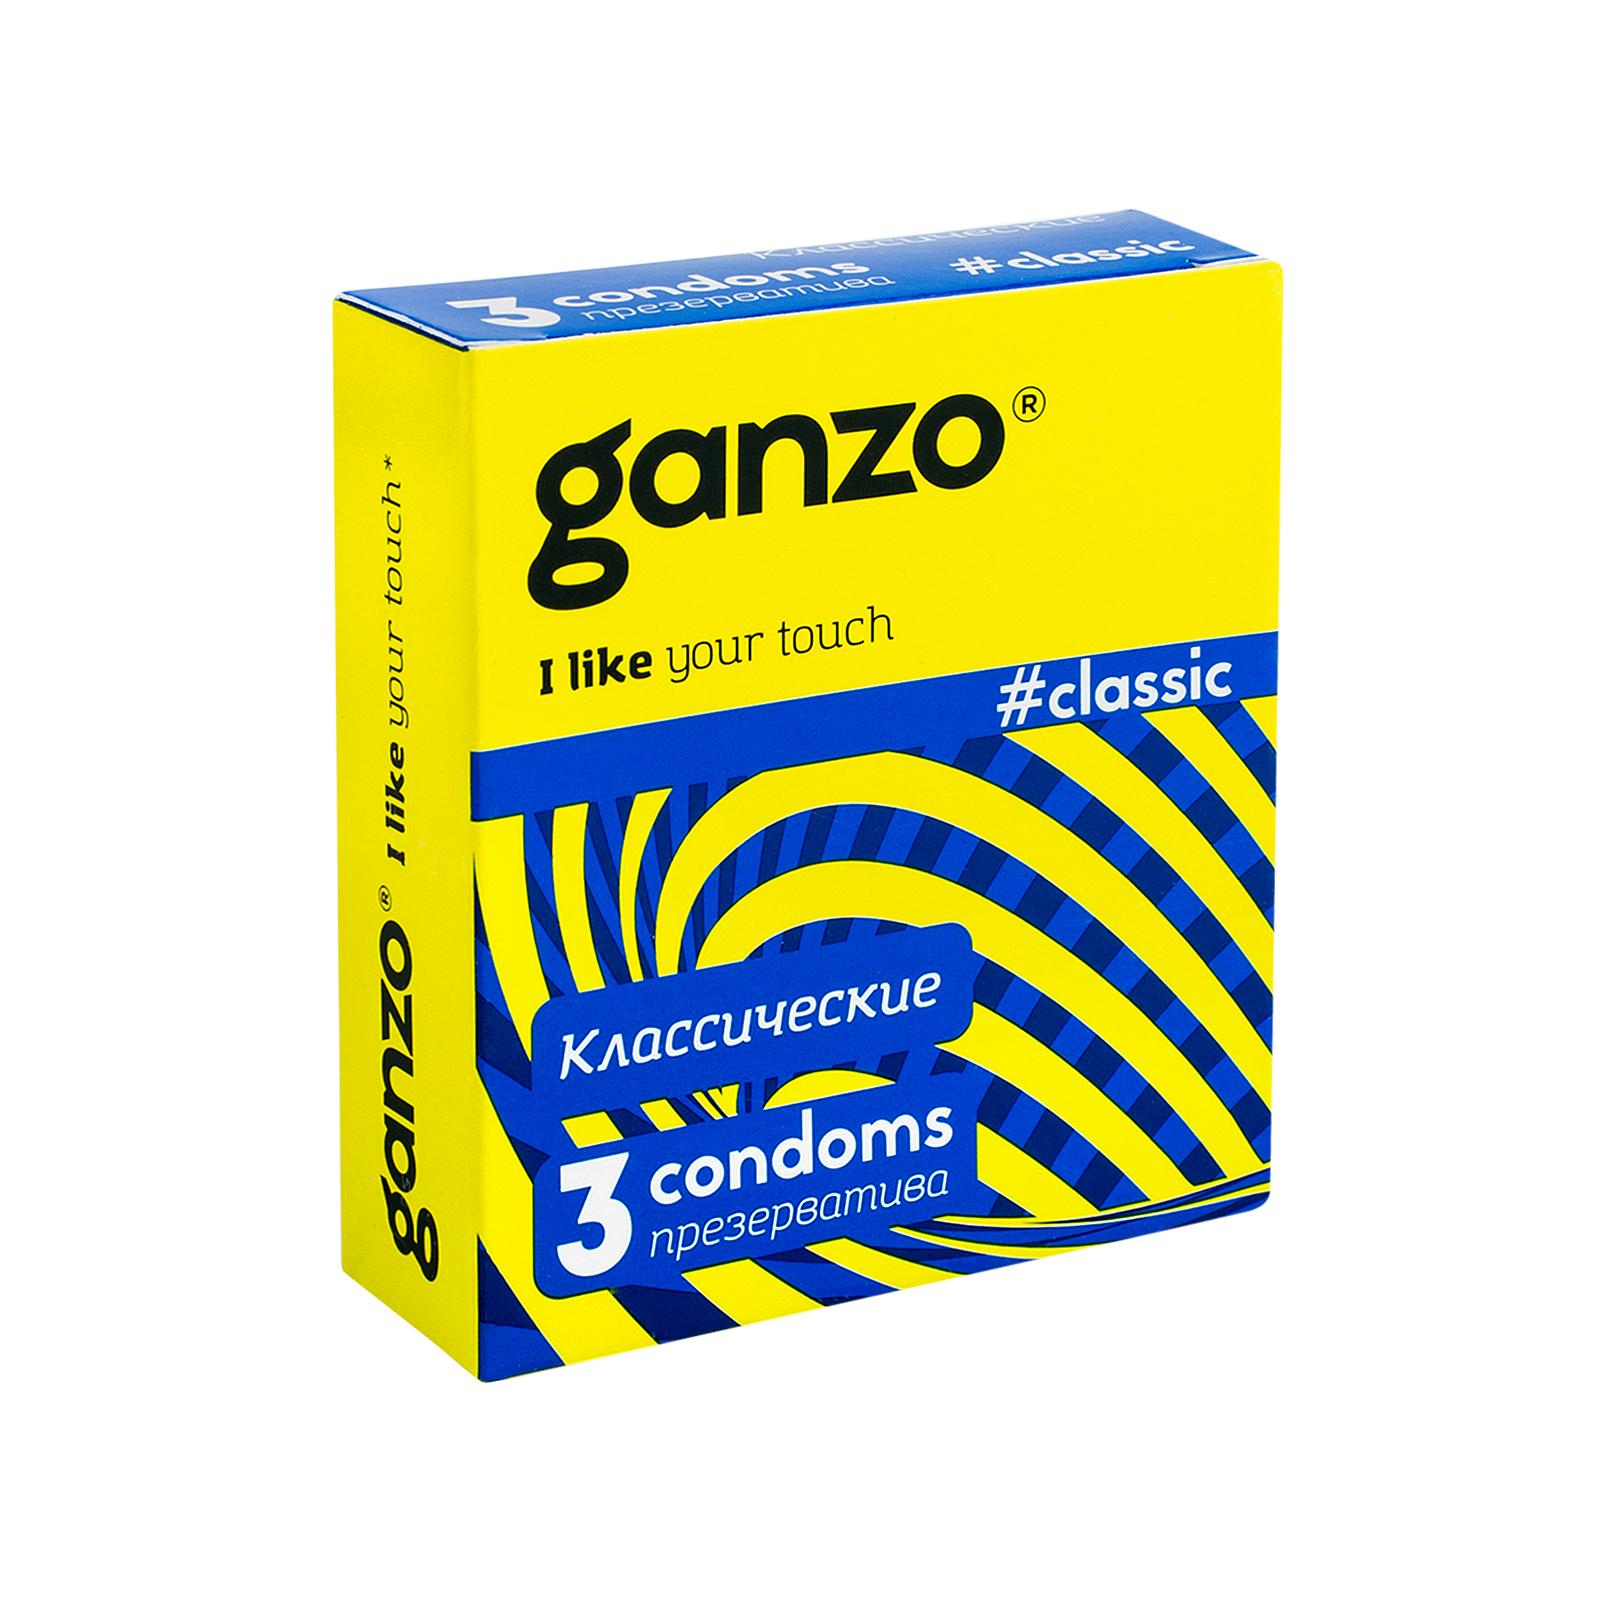 Ганзо презервативы №3 классик